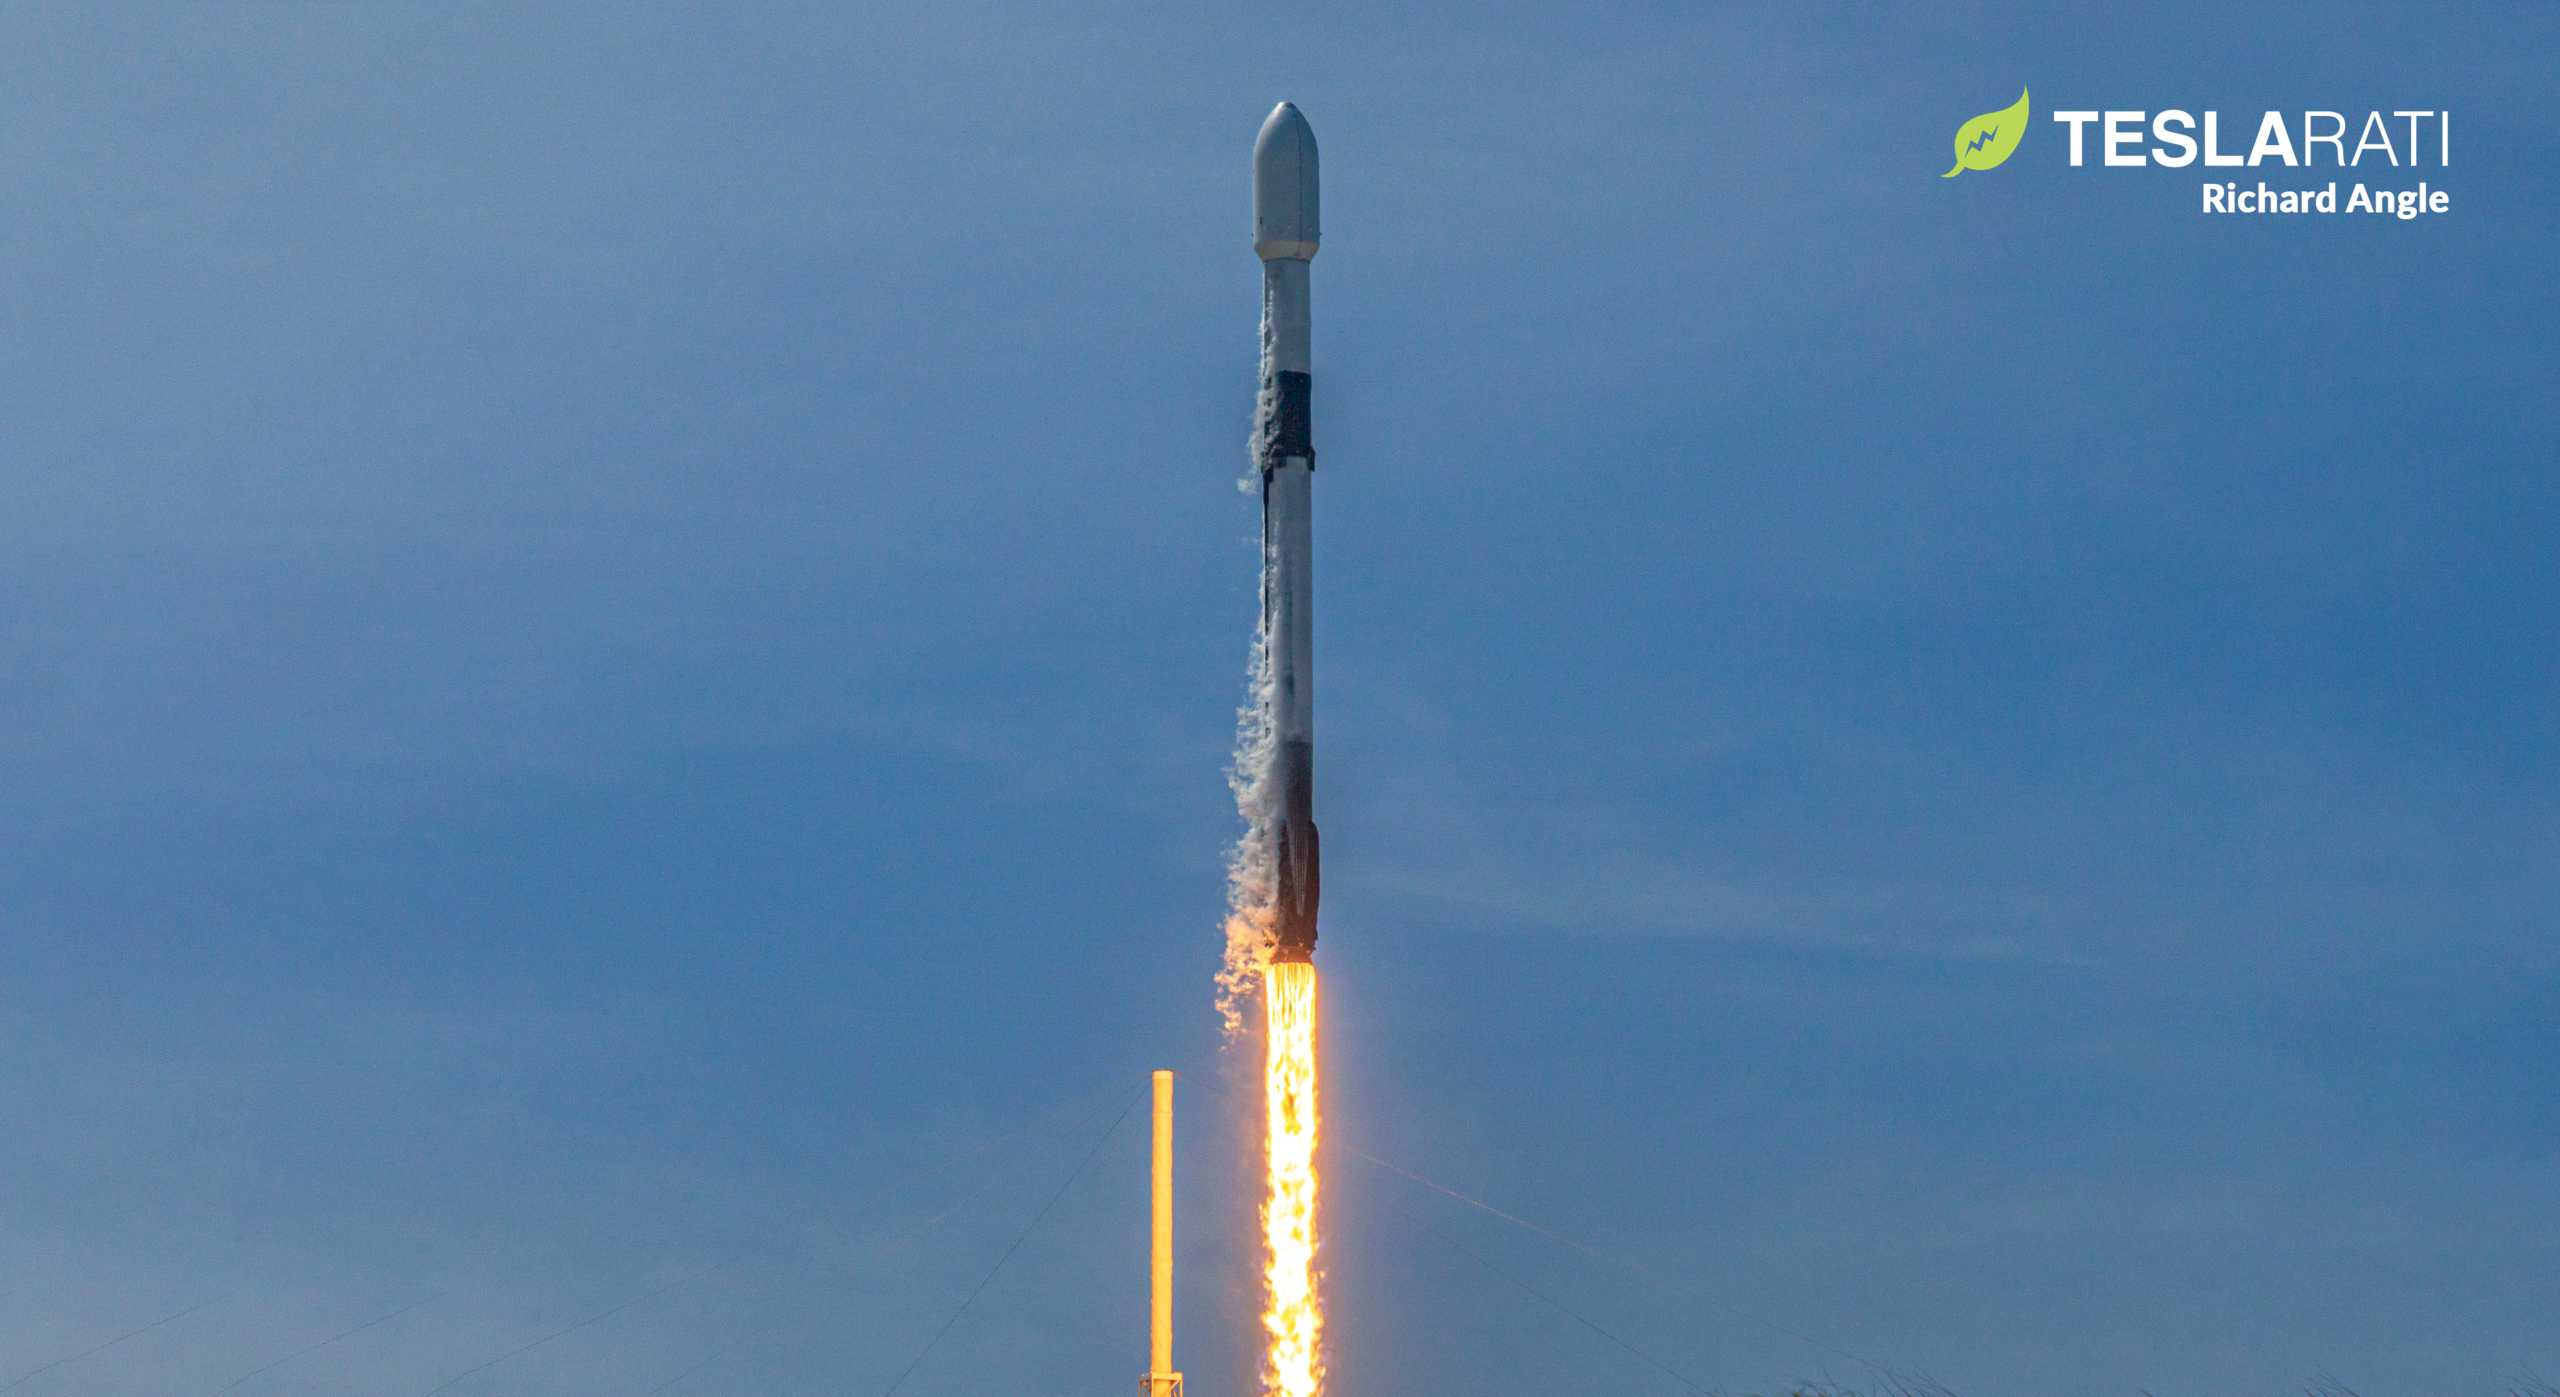 Falcon 9 Starlink 6 042220 (Richard Angle) launch 7 crop 1 (c)